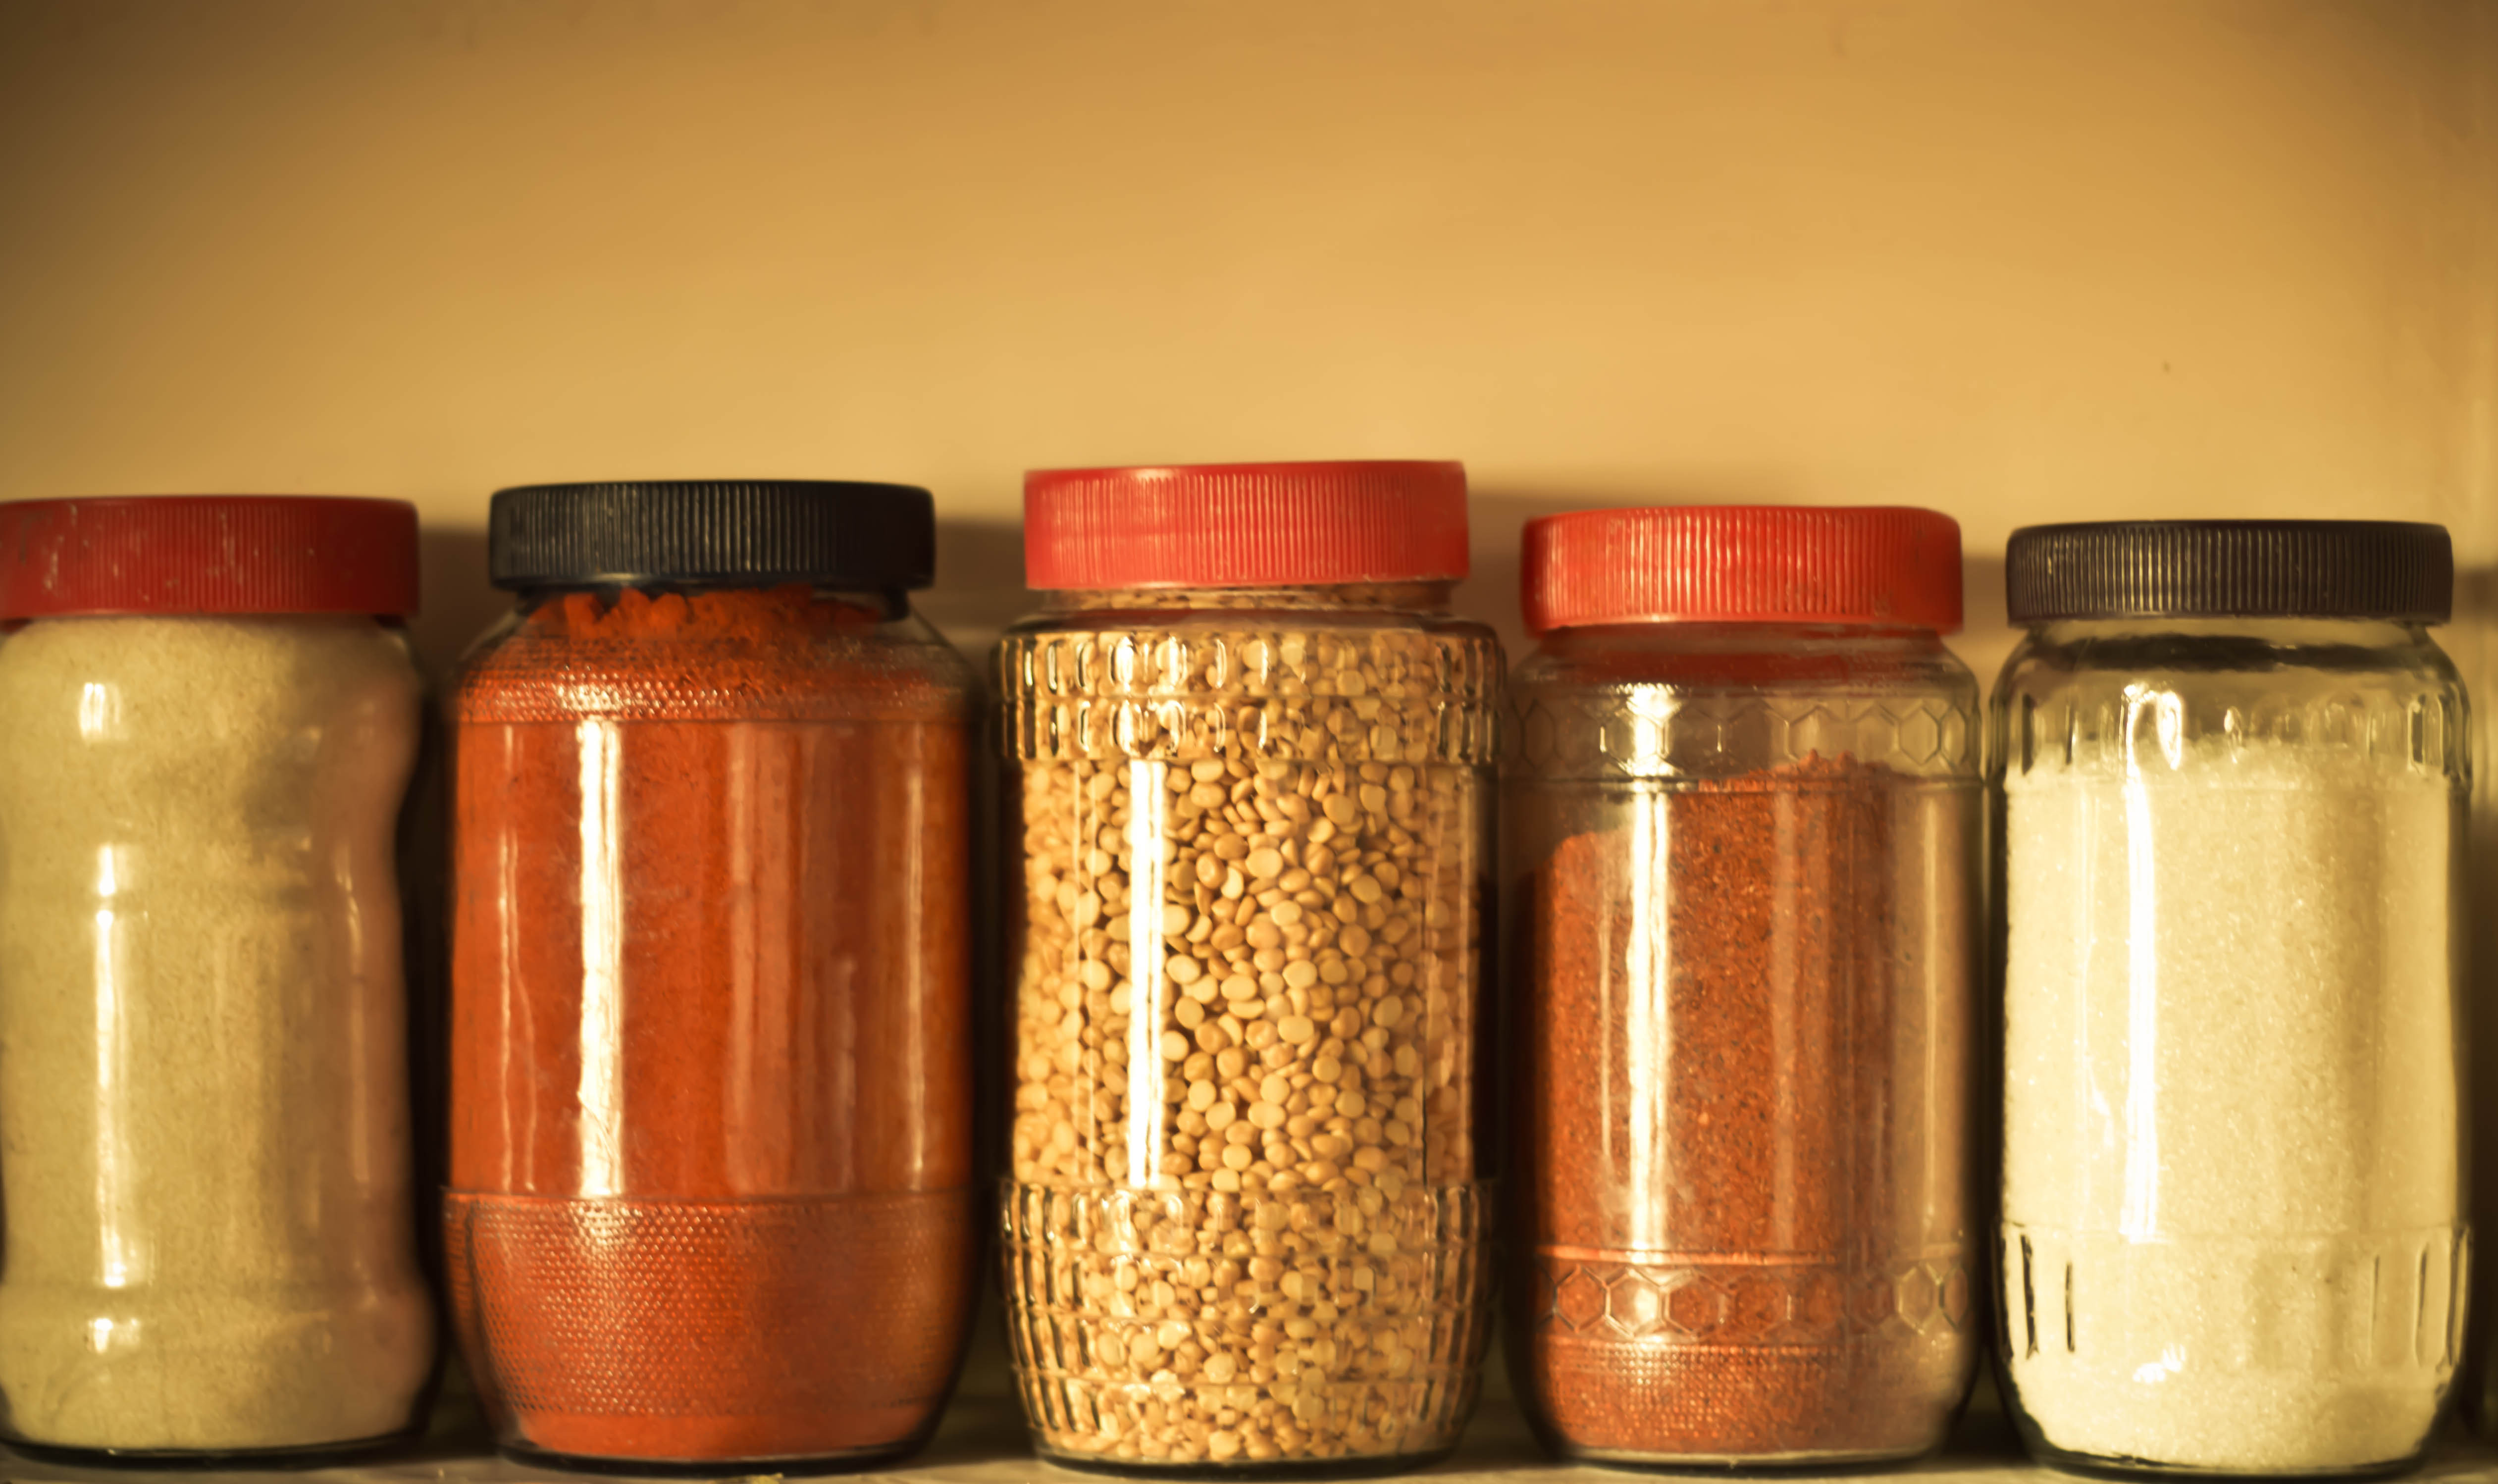 india food diversity